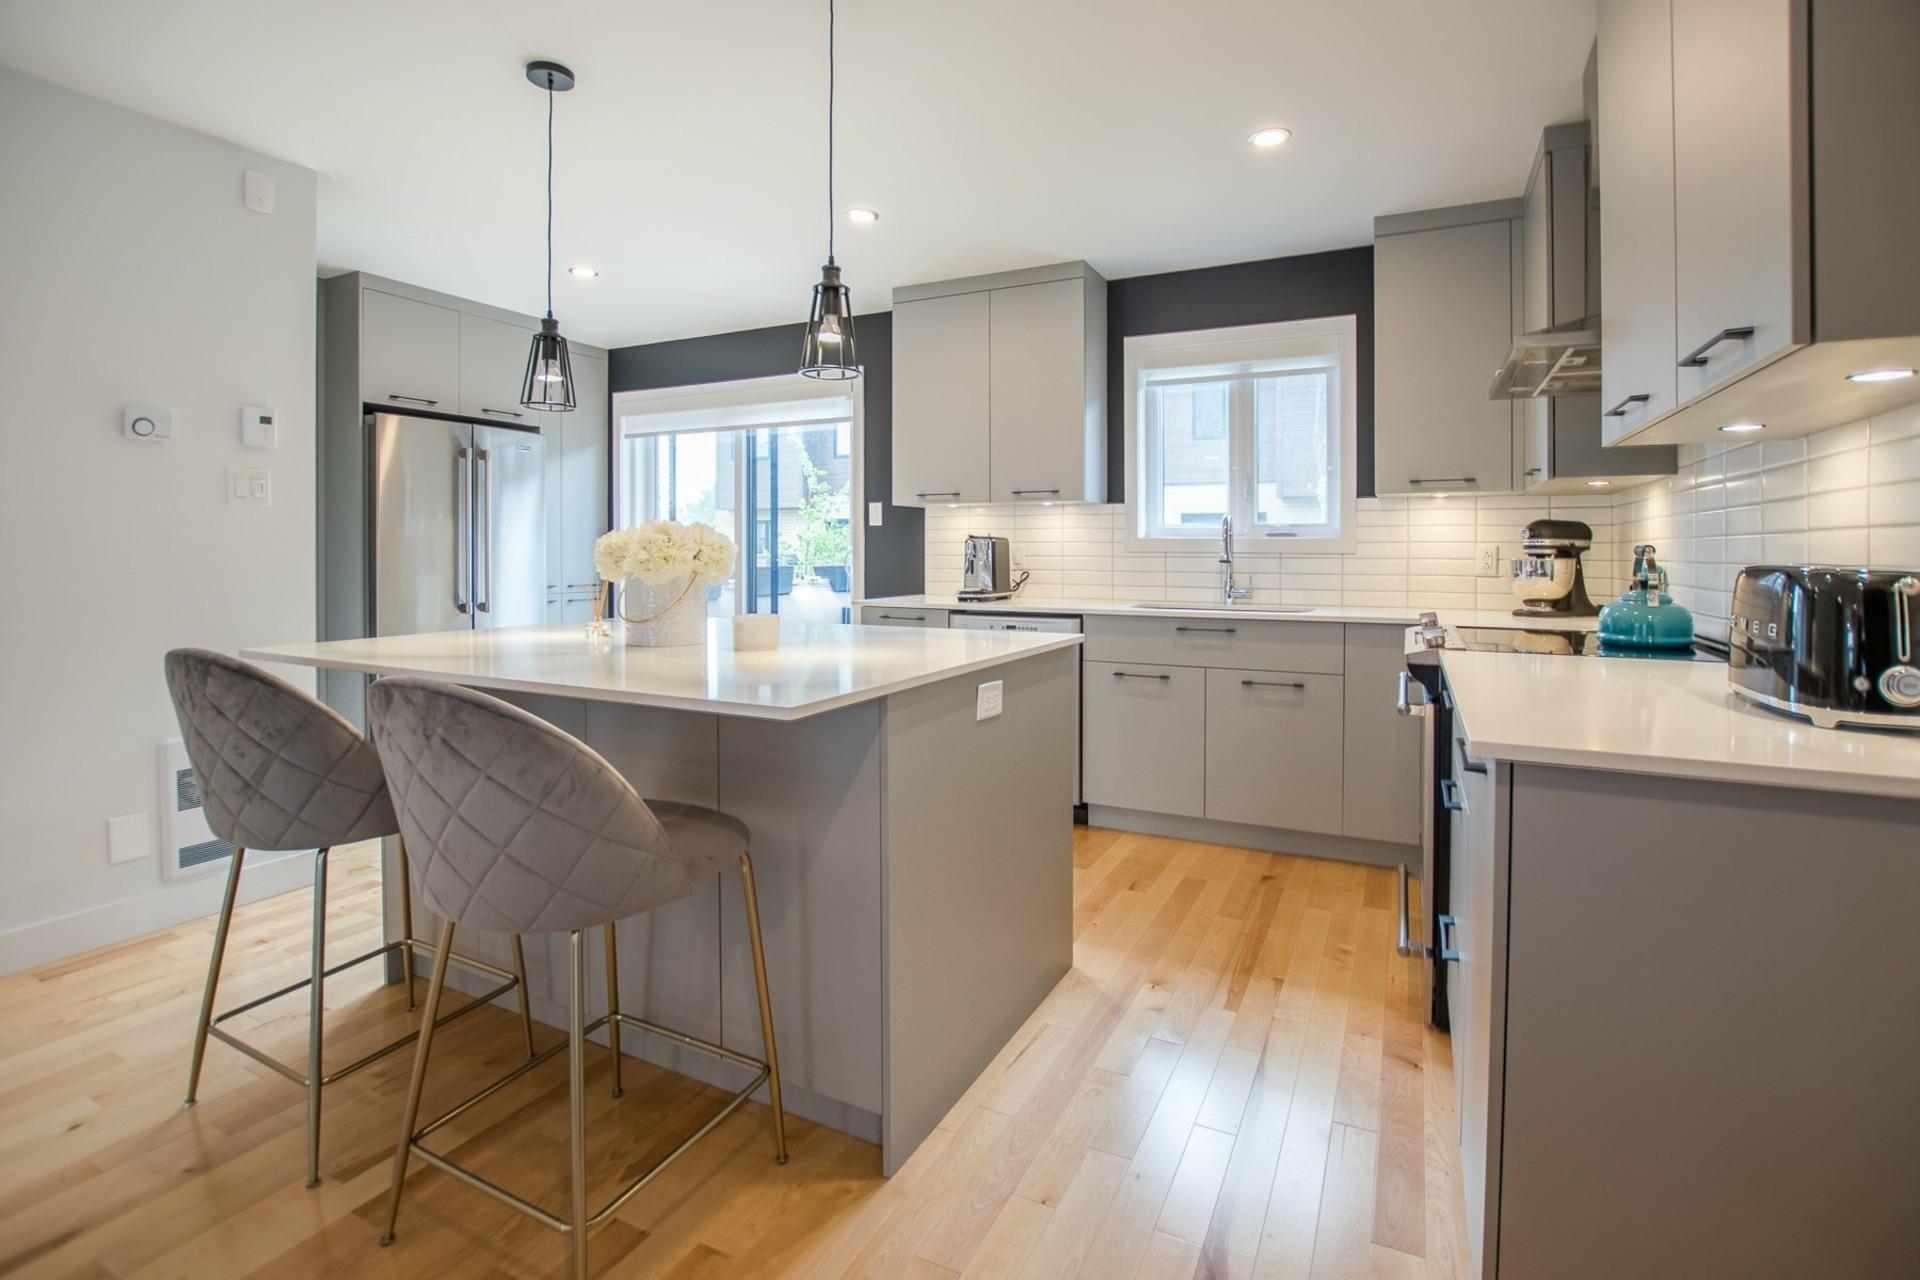 image 1 - MX - Casa sola - MX En venta Saint-Constant - 10 habitaciones